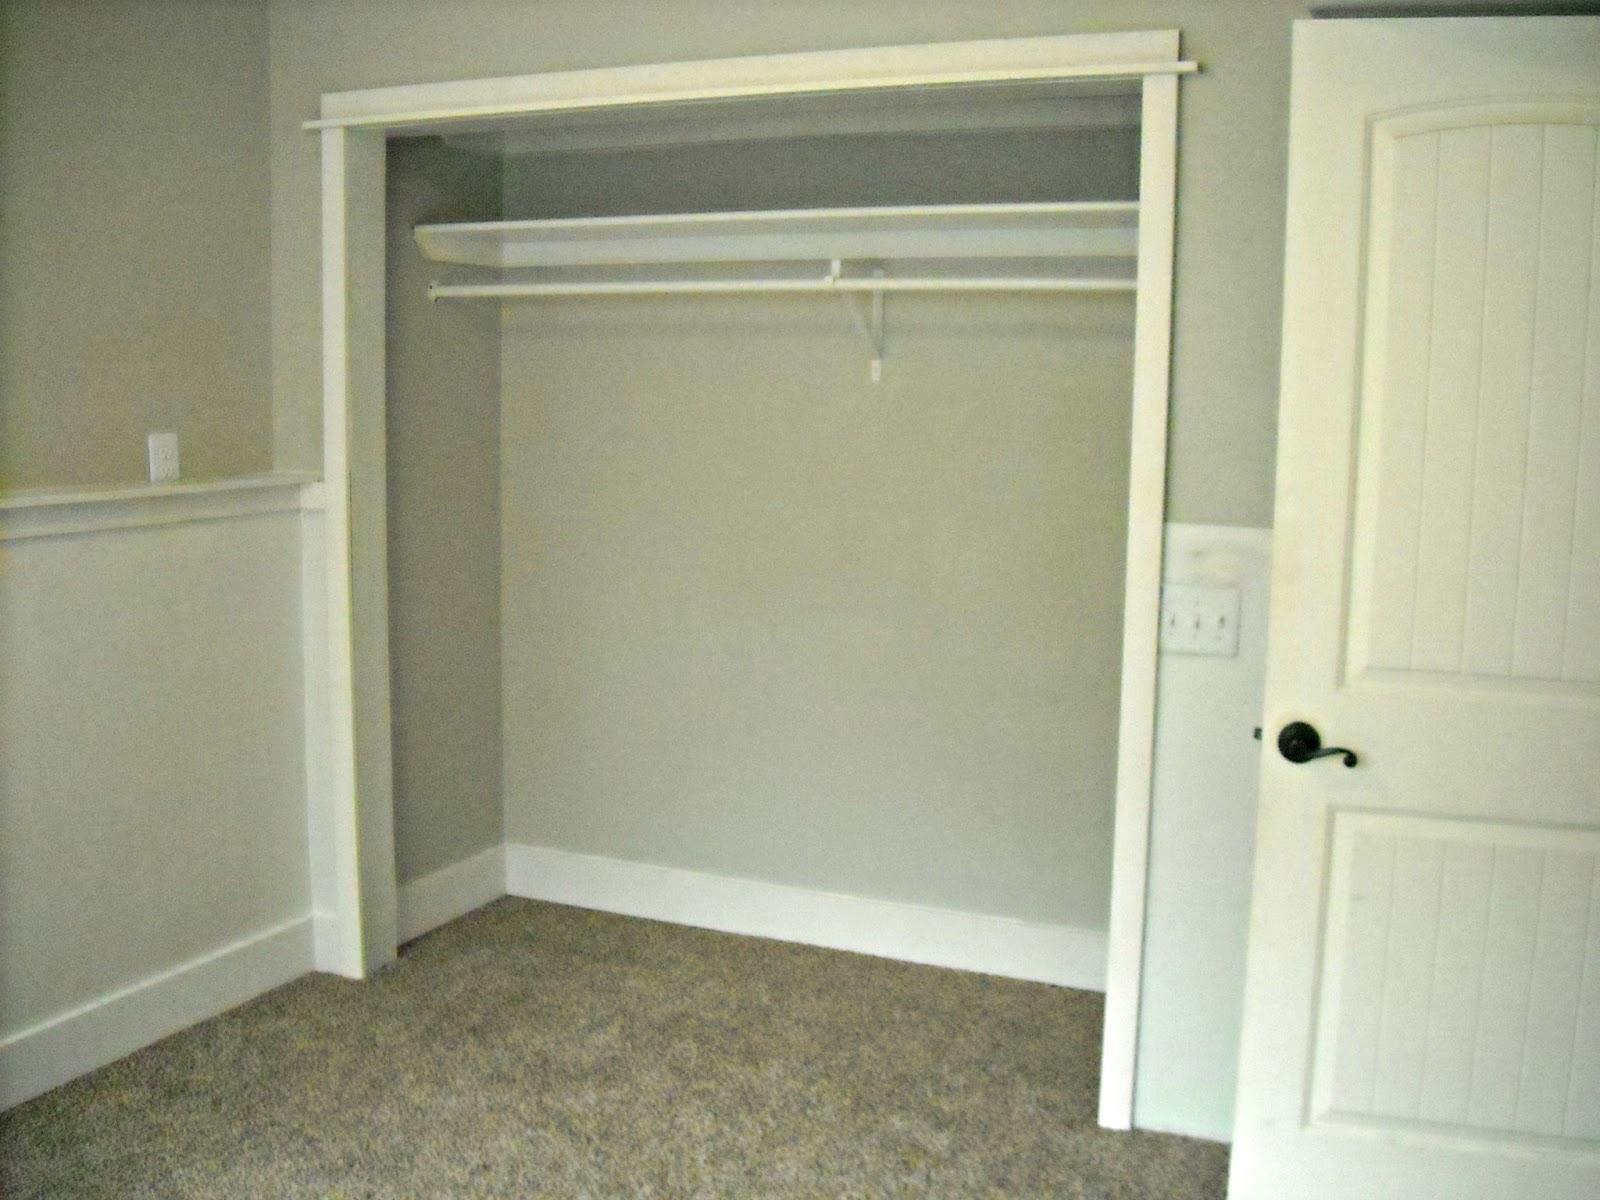 split level bedroom ideas split level kitchen remodel Keep Home Simple Our Split Level Fixer Upper